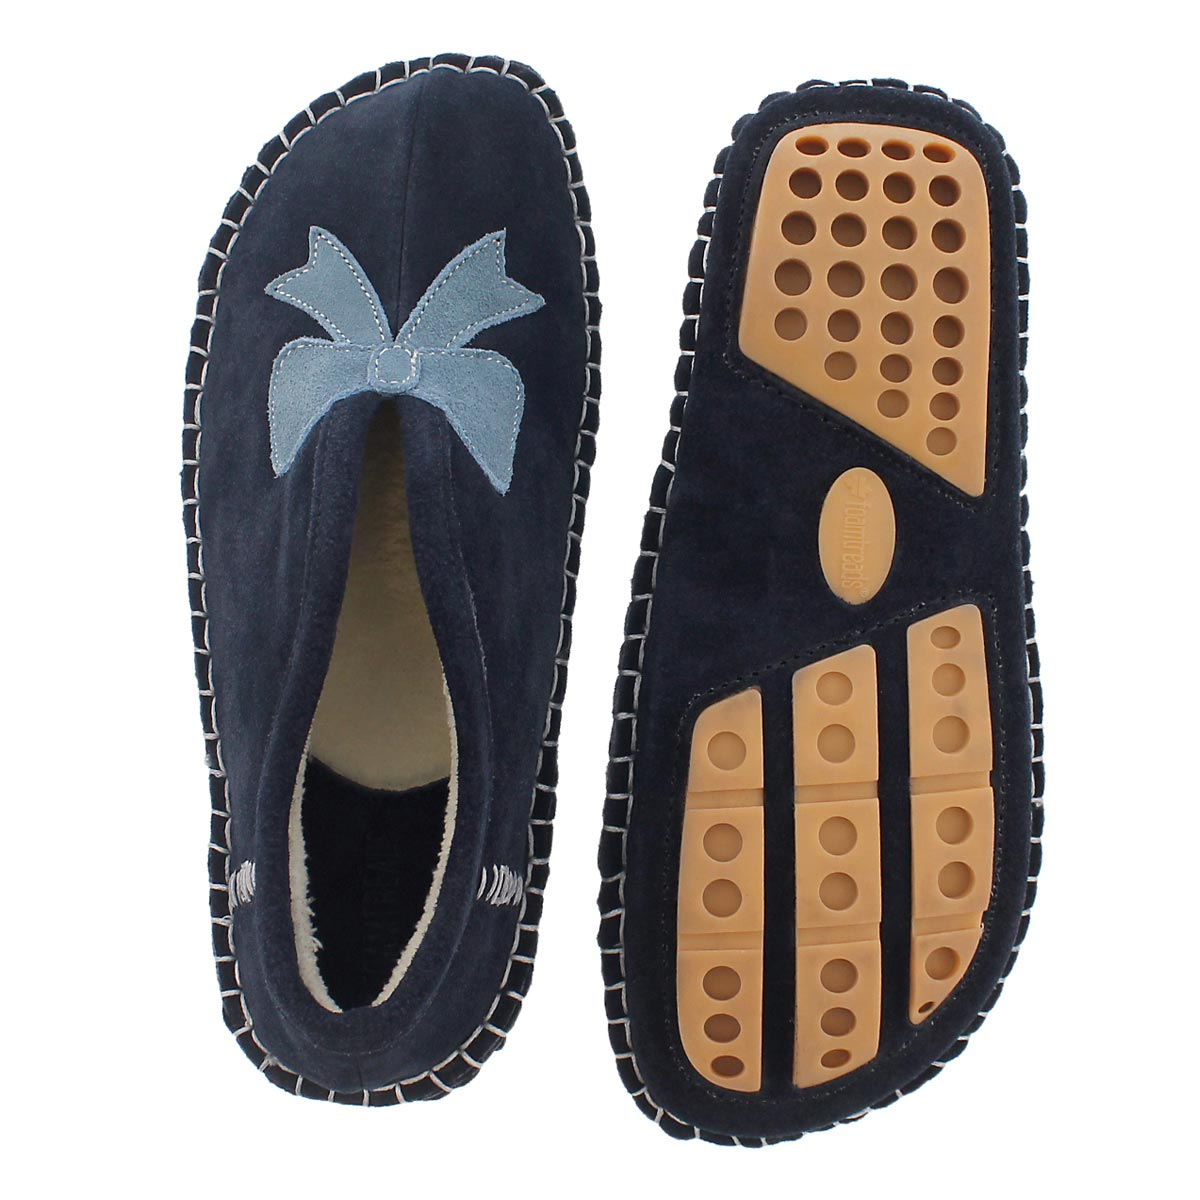 Lds Blossom navy closed back slipper